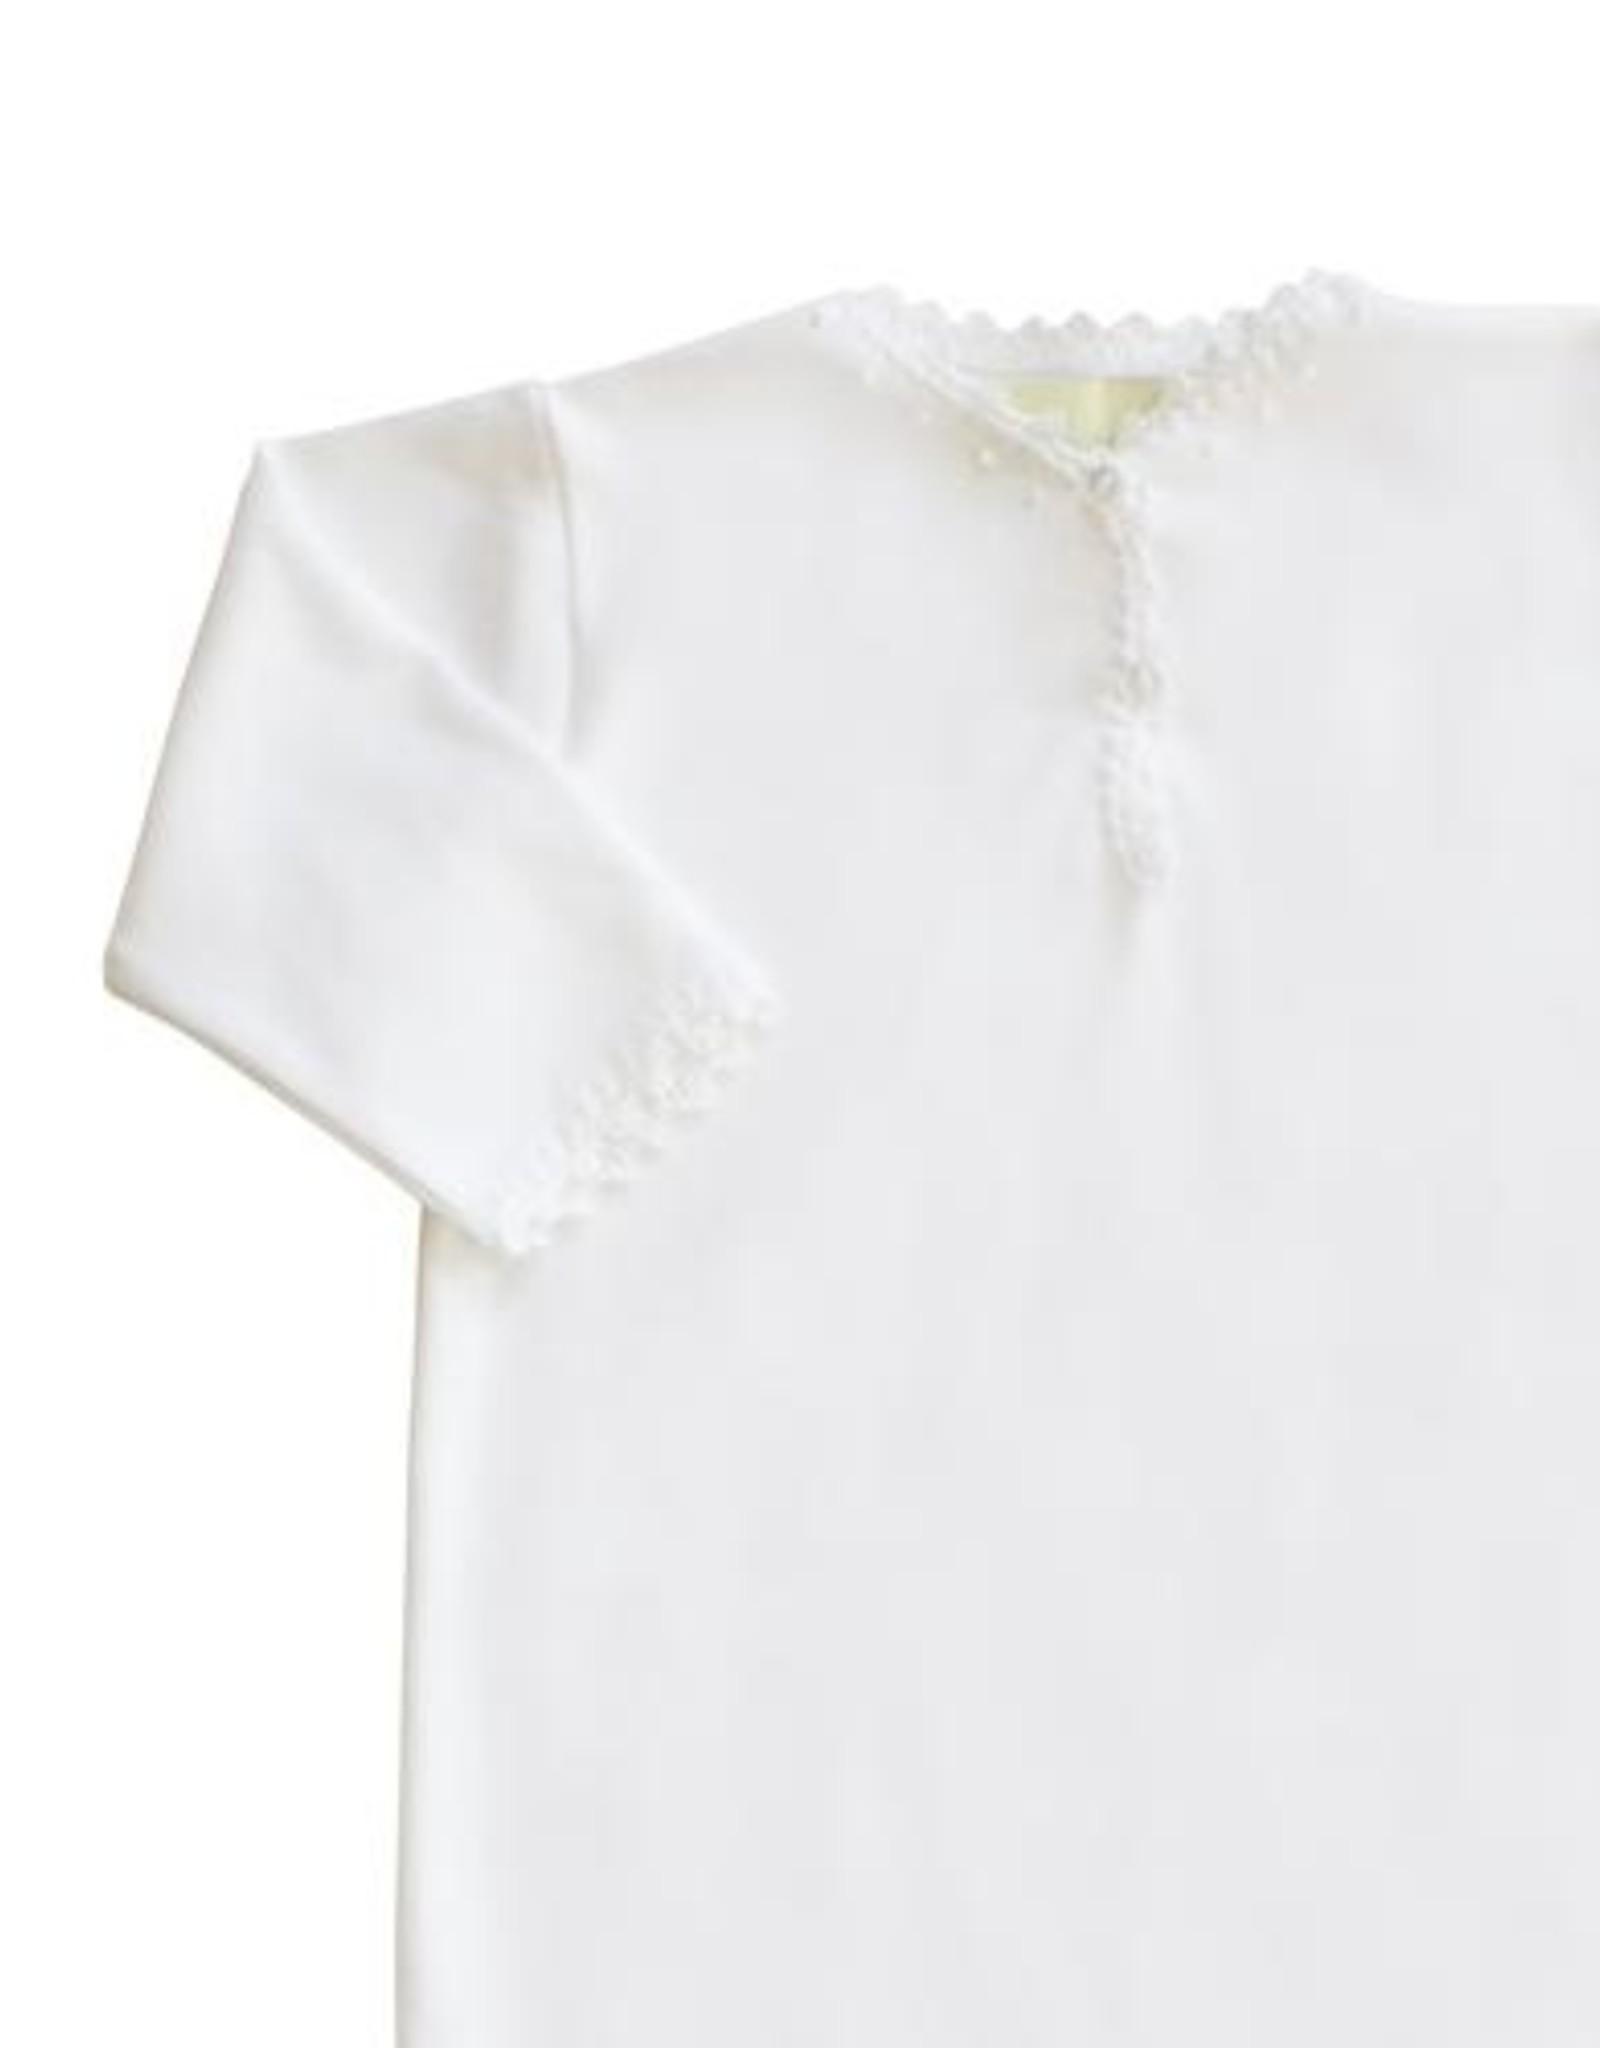 Pixie Lily White Jersey Sack